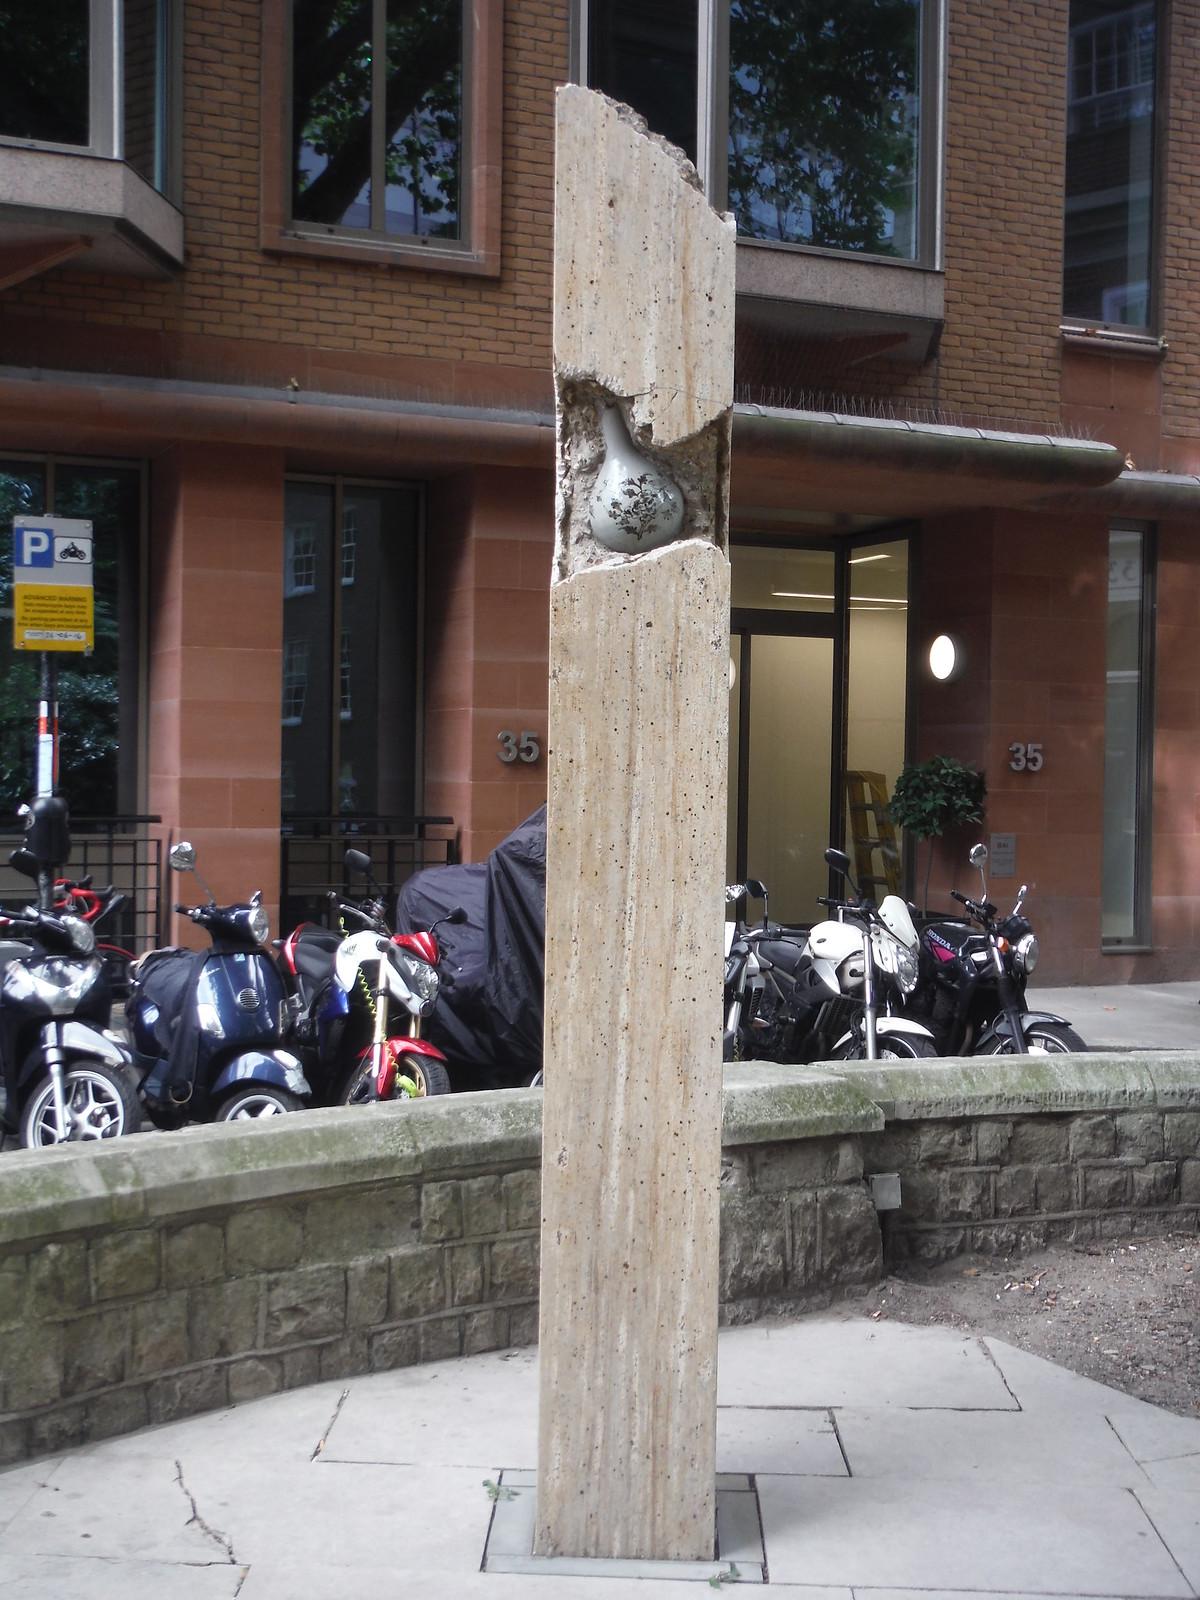 Shan Hur - Broken Pillar #12 SWC Walk Short 24 - Sculpture in the City